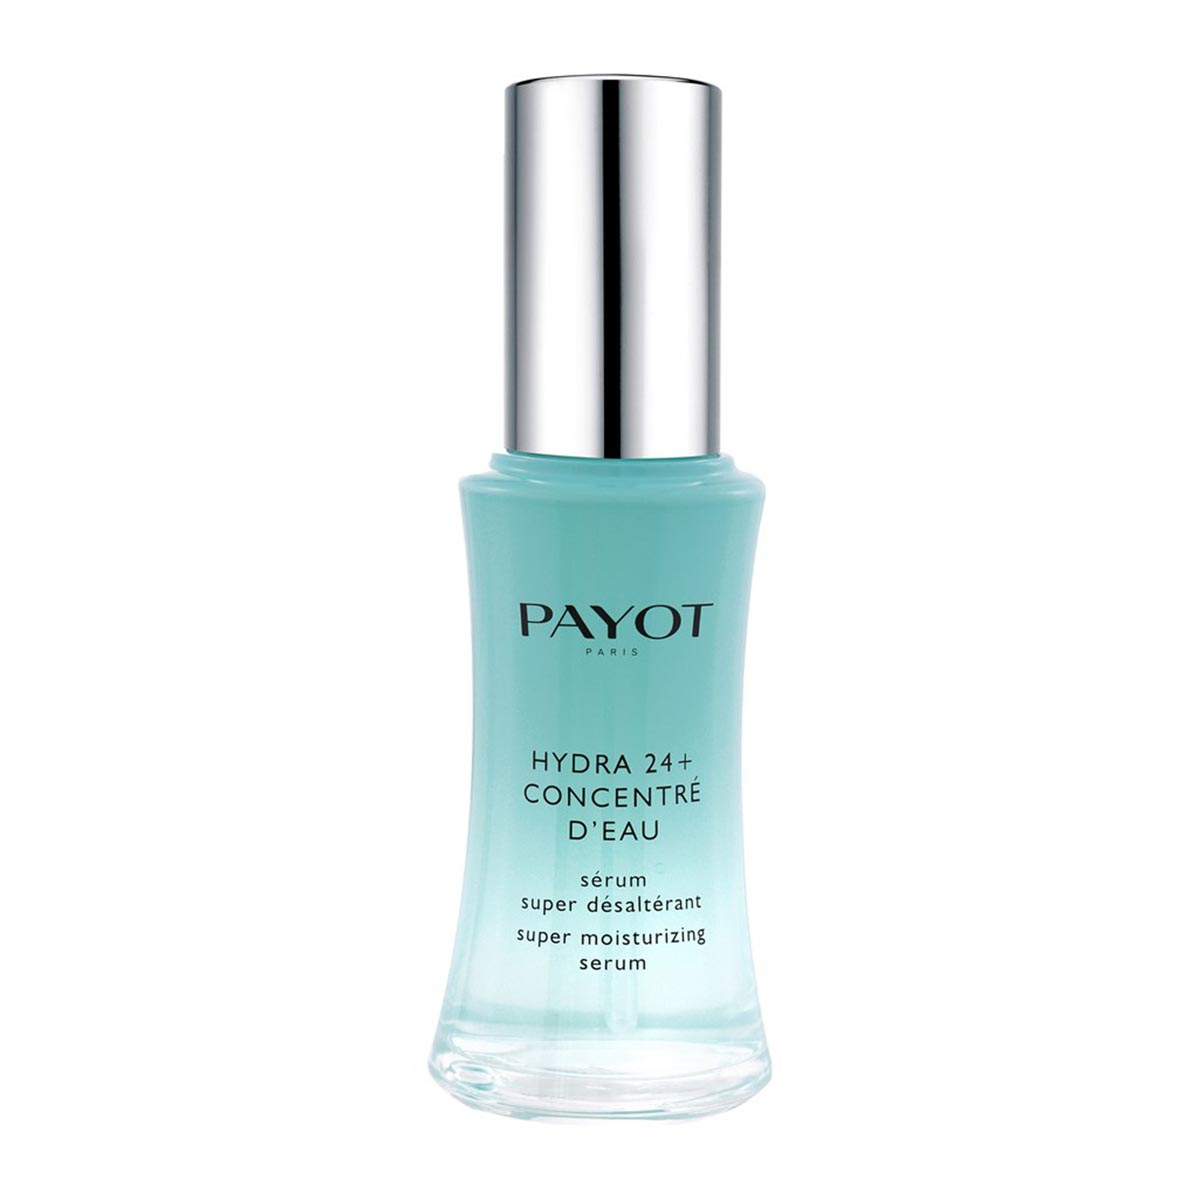 Payot hydra 24 concentre d eau super moisturizing serum 30ml